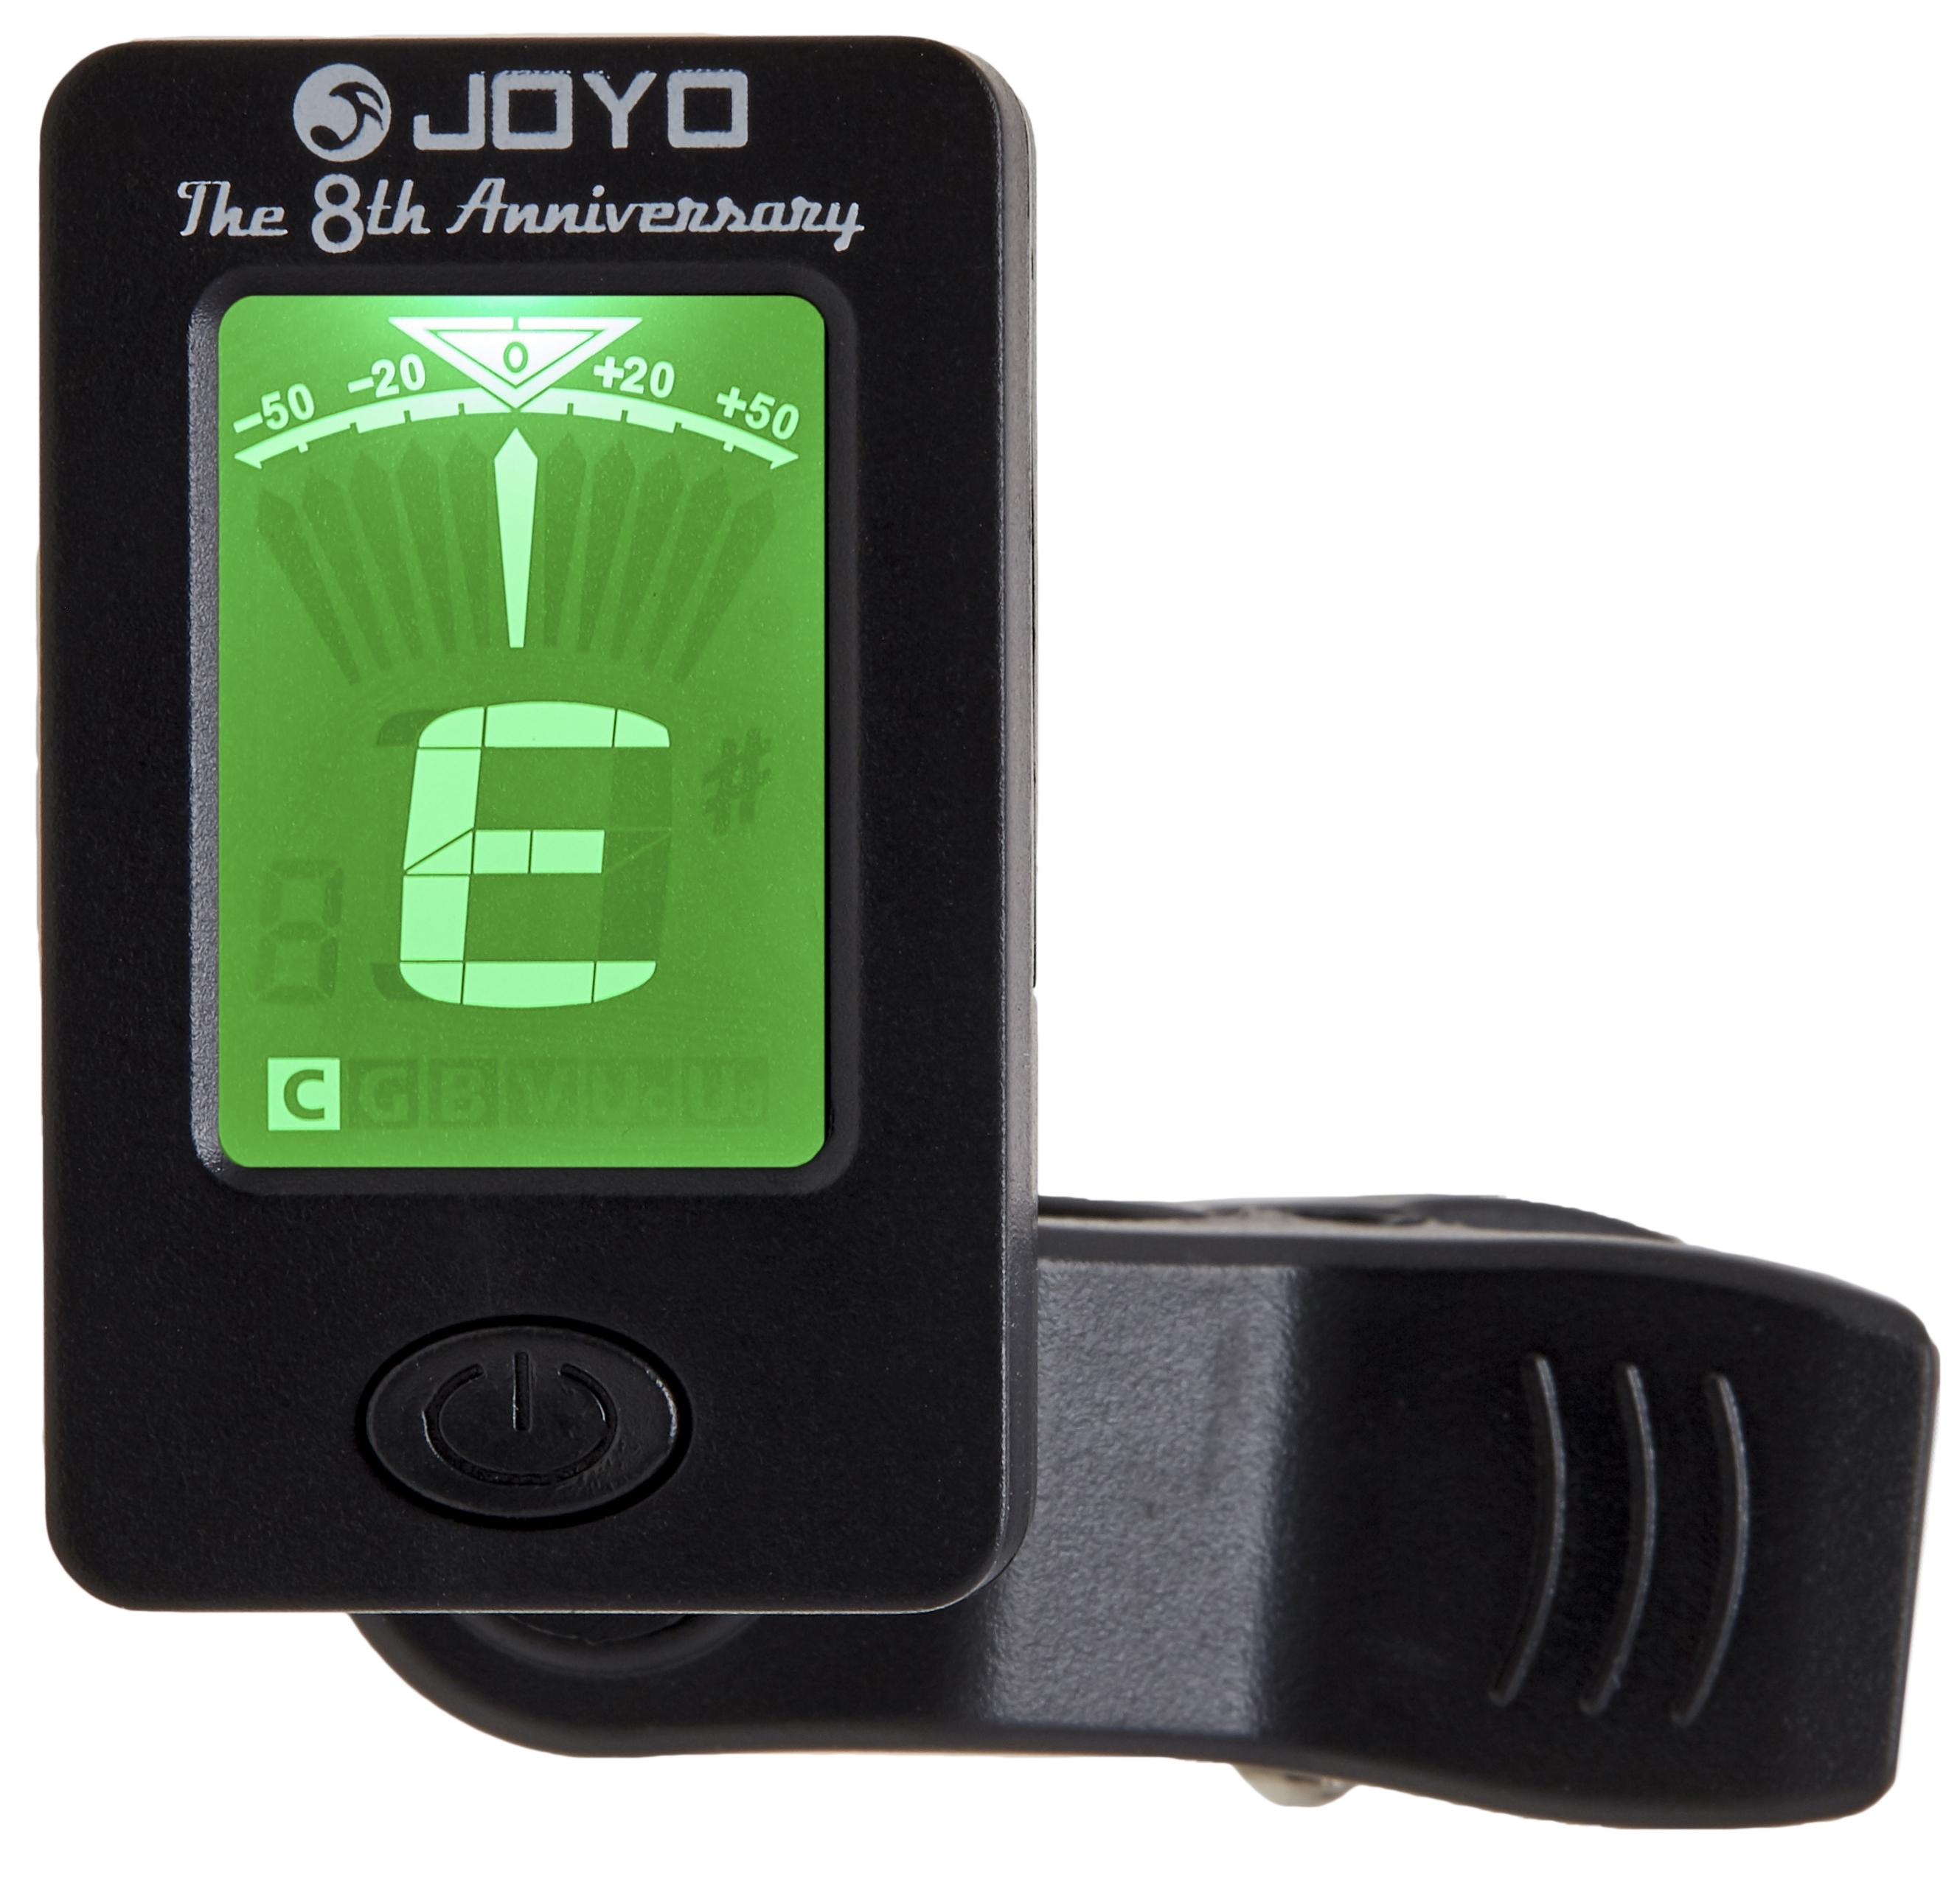 JOYO JT-01